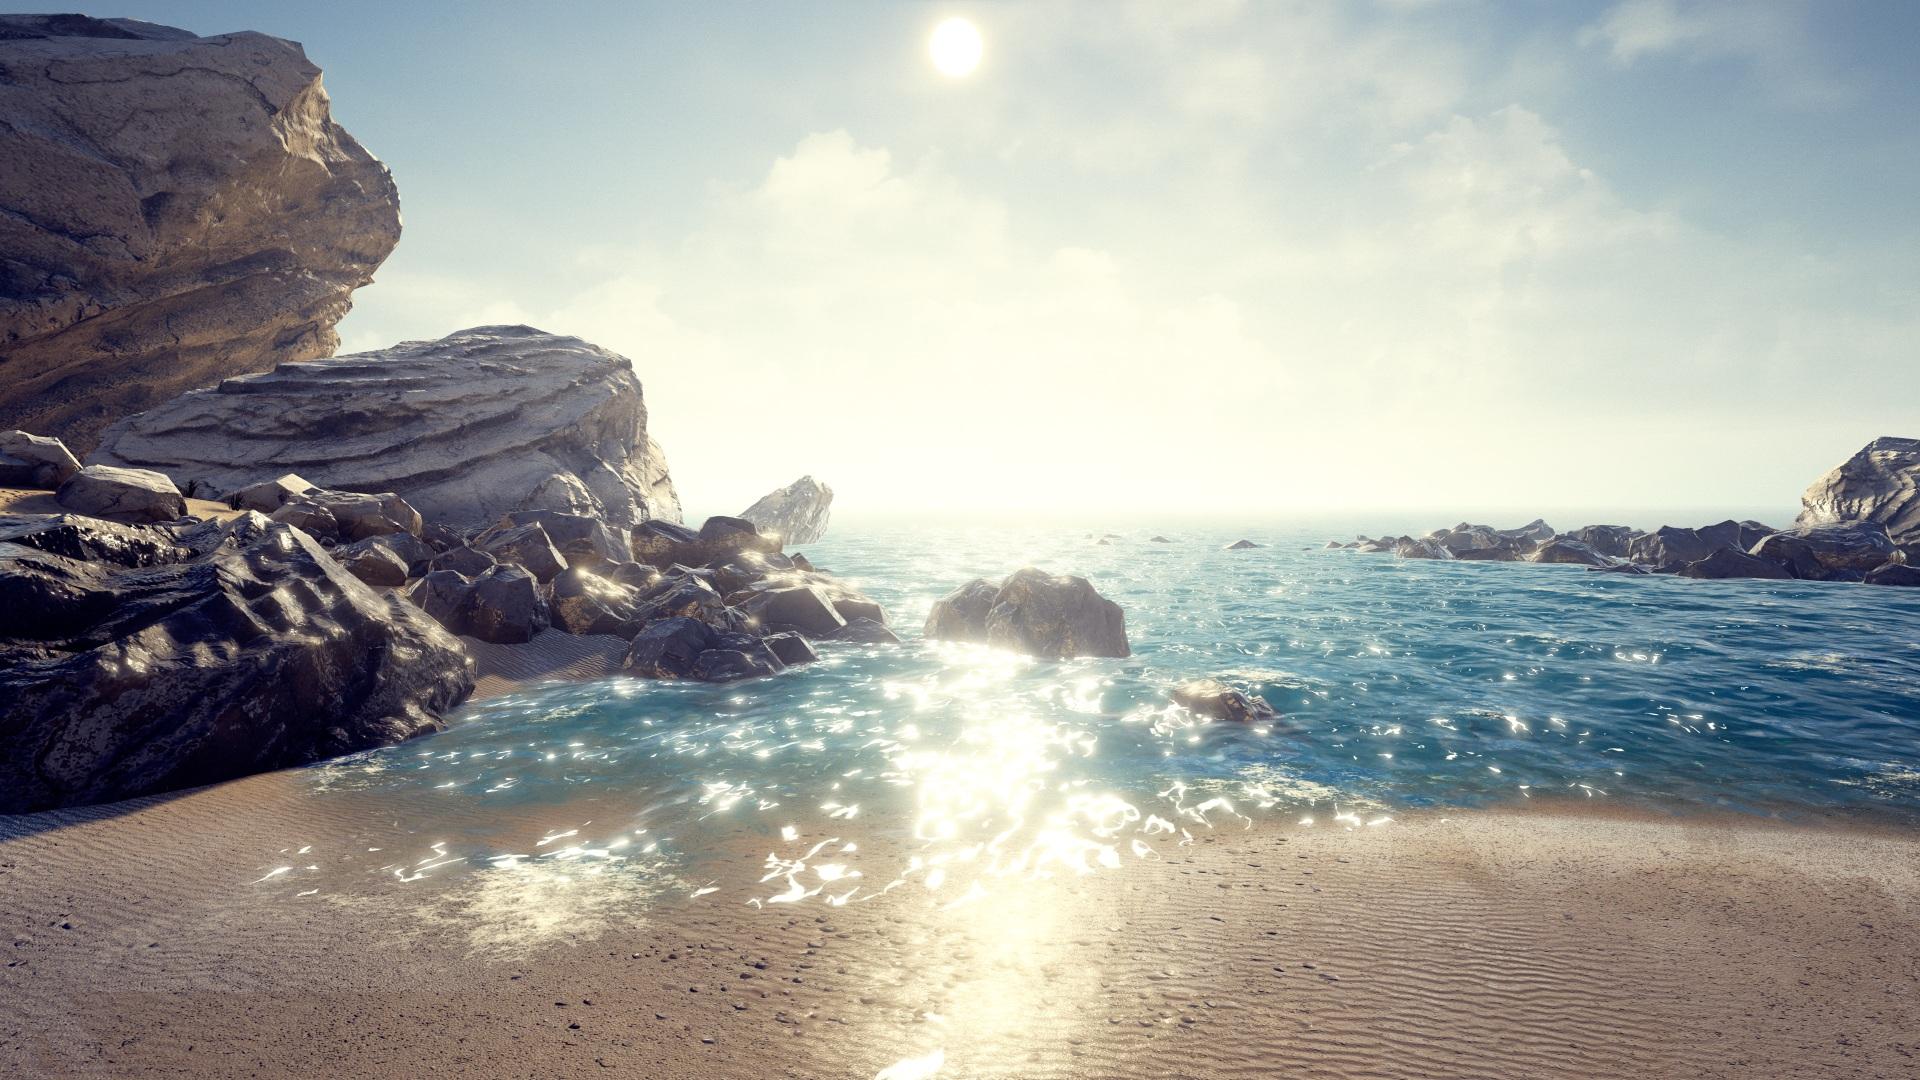 UE4 Beach scene | David Miranda